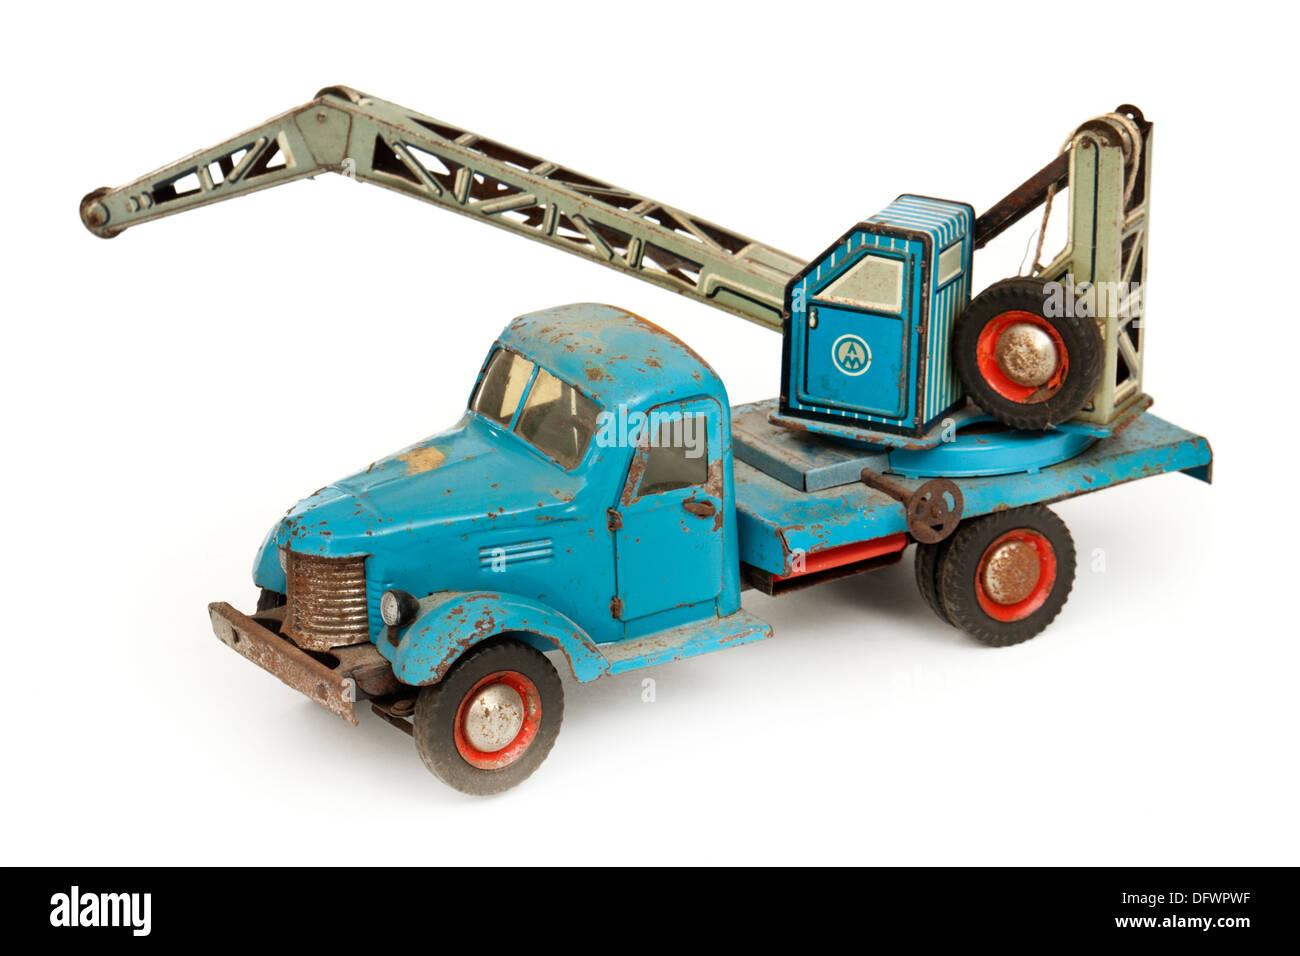 Vintage 1950's tinplate Russian ZIL toy breakdown truck / crane - Stock Image